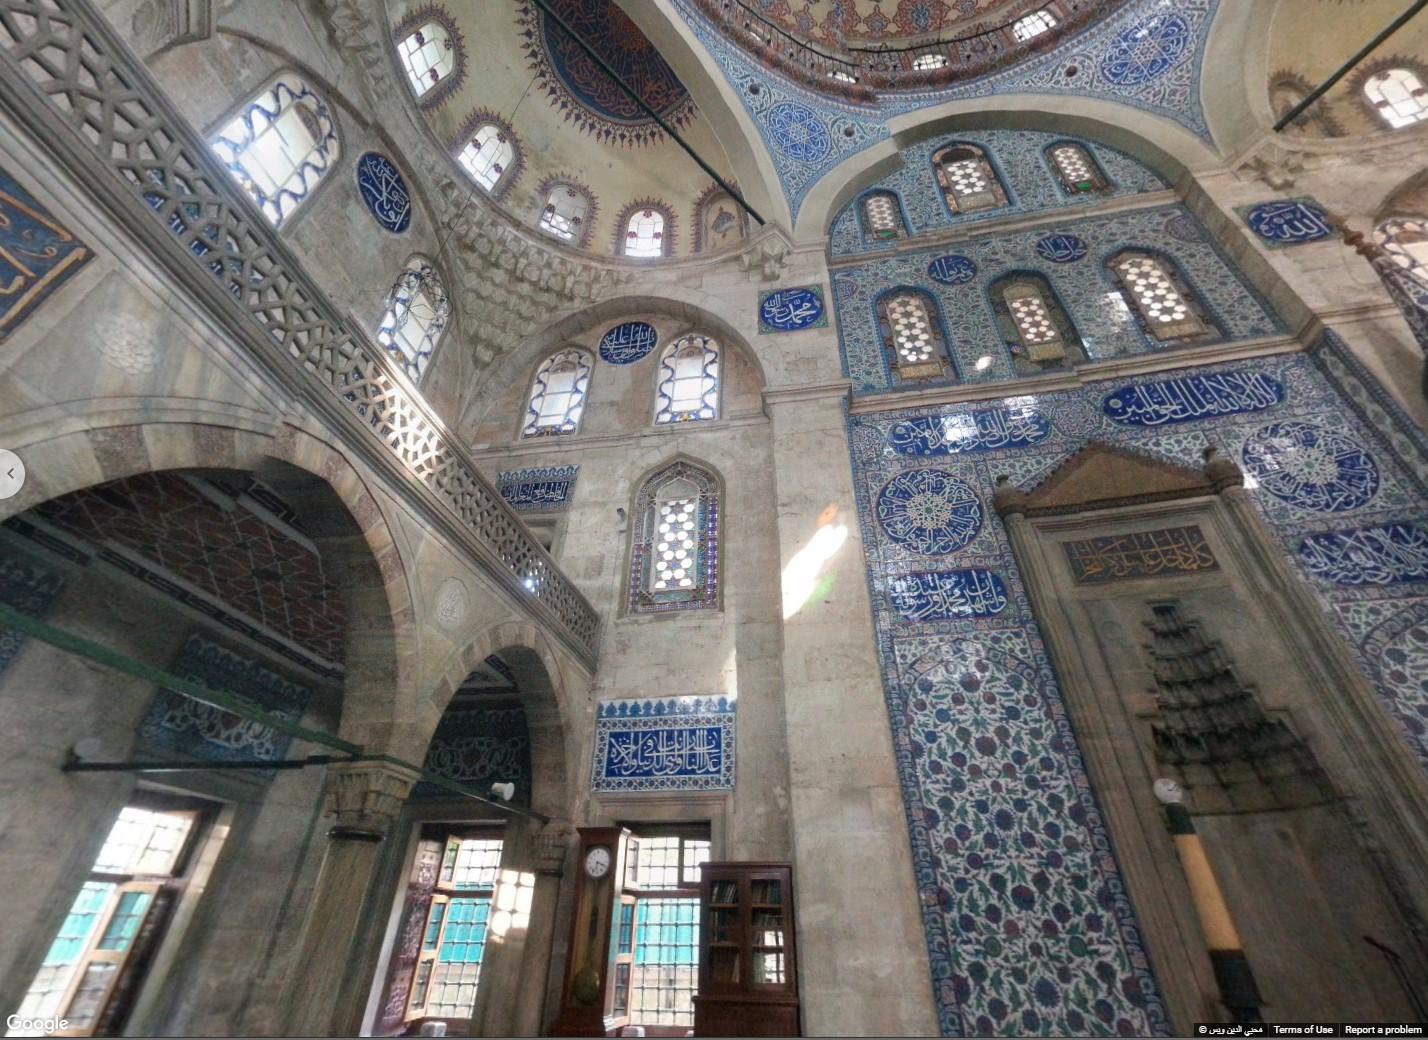 Sokollu Mehmet Pasha Mosque in present-day Istanbul, Turkey